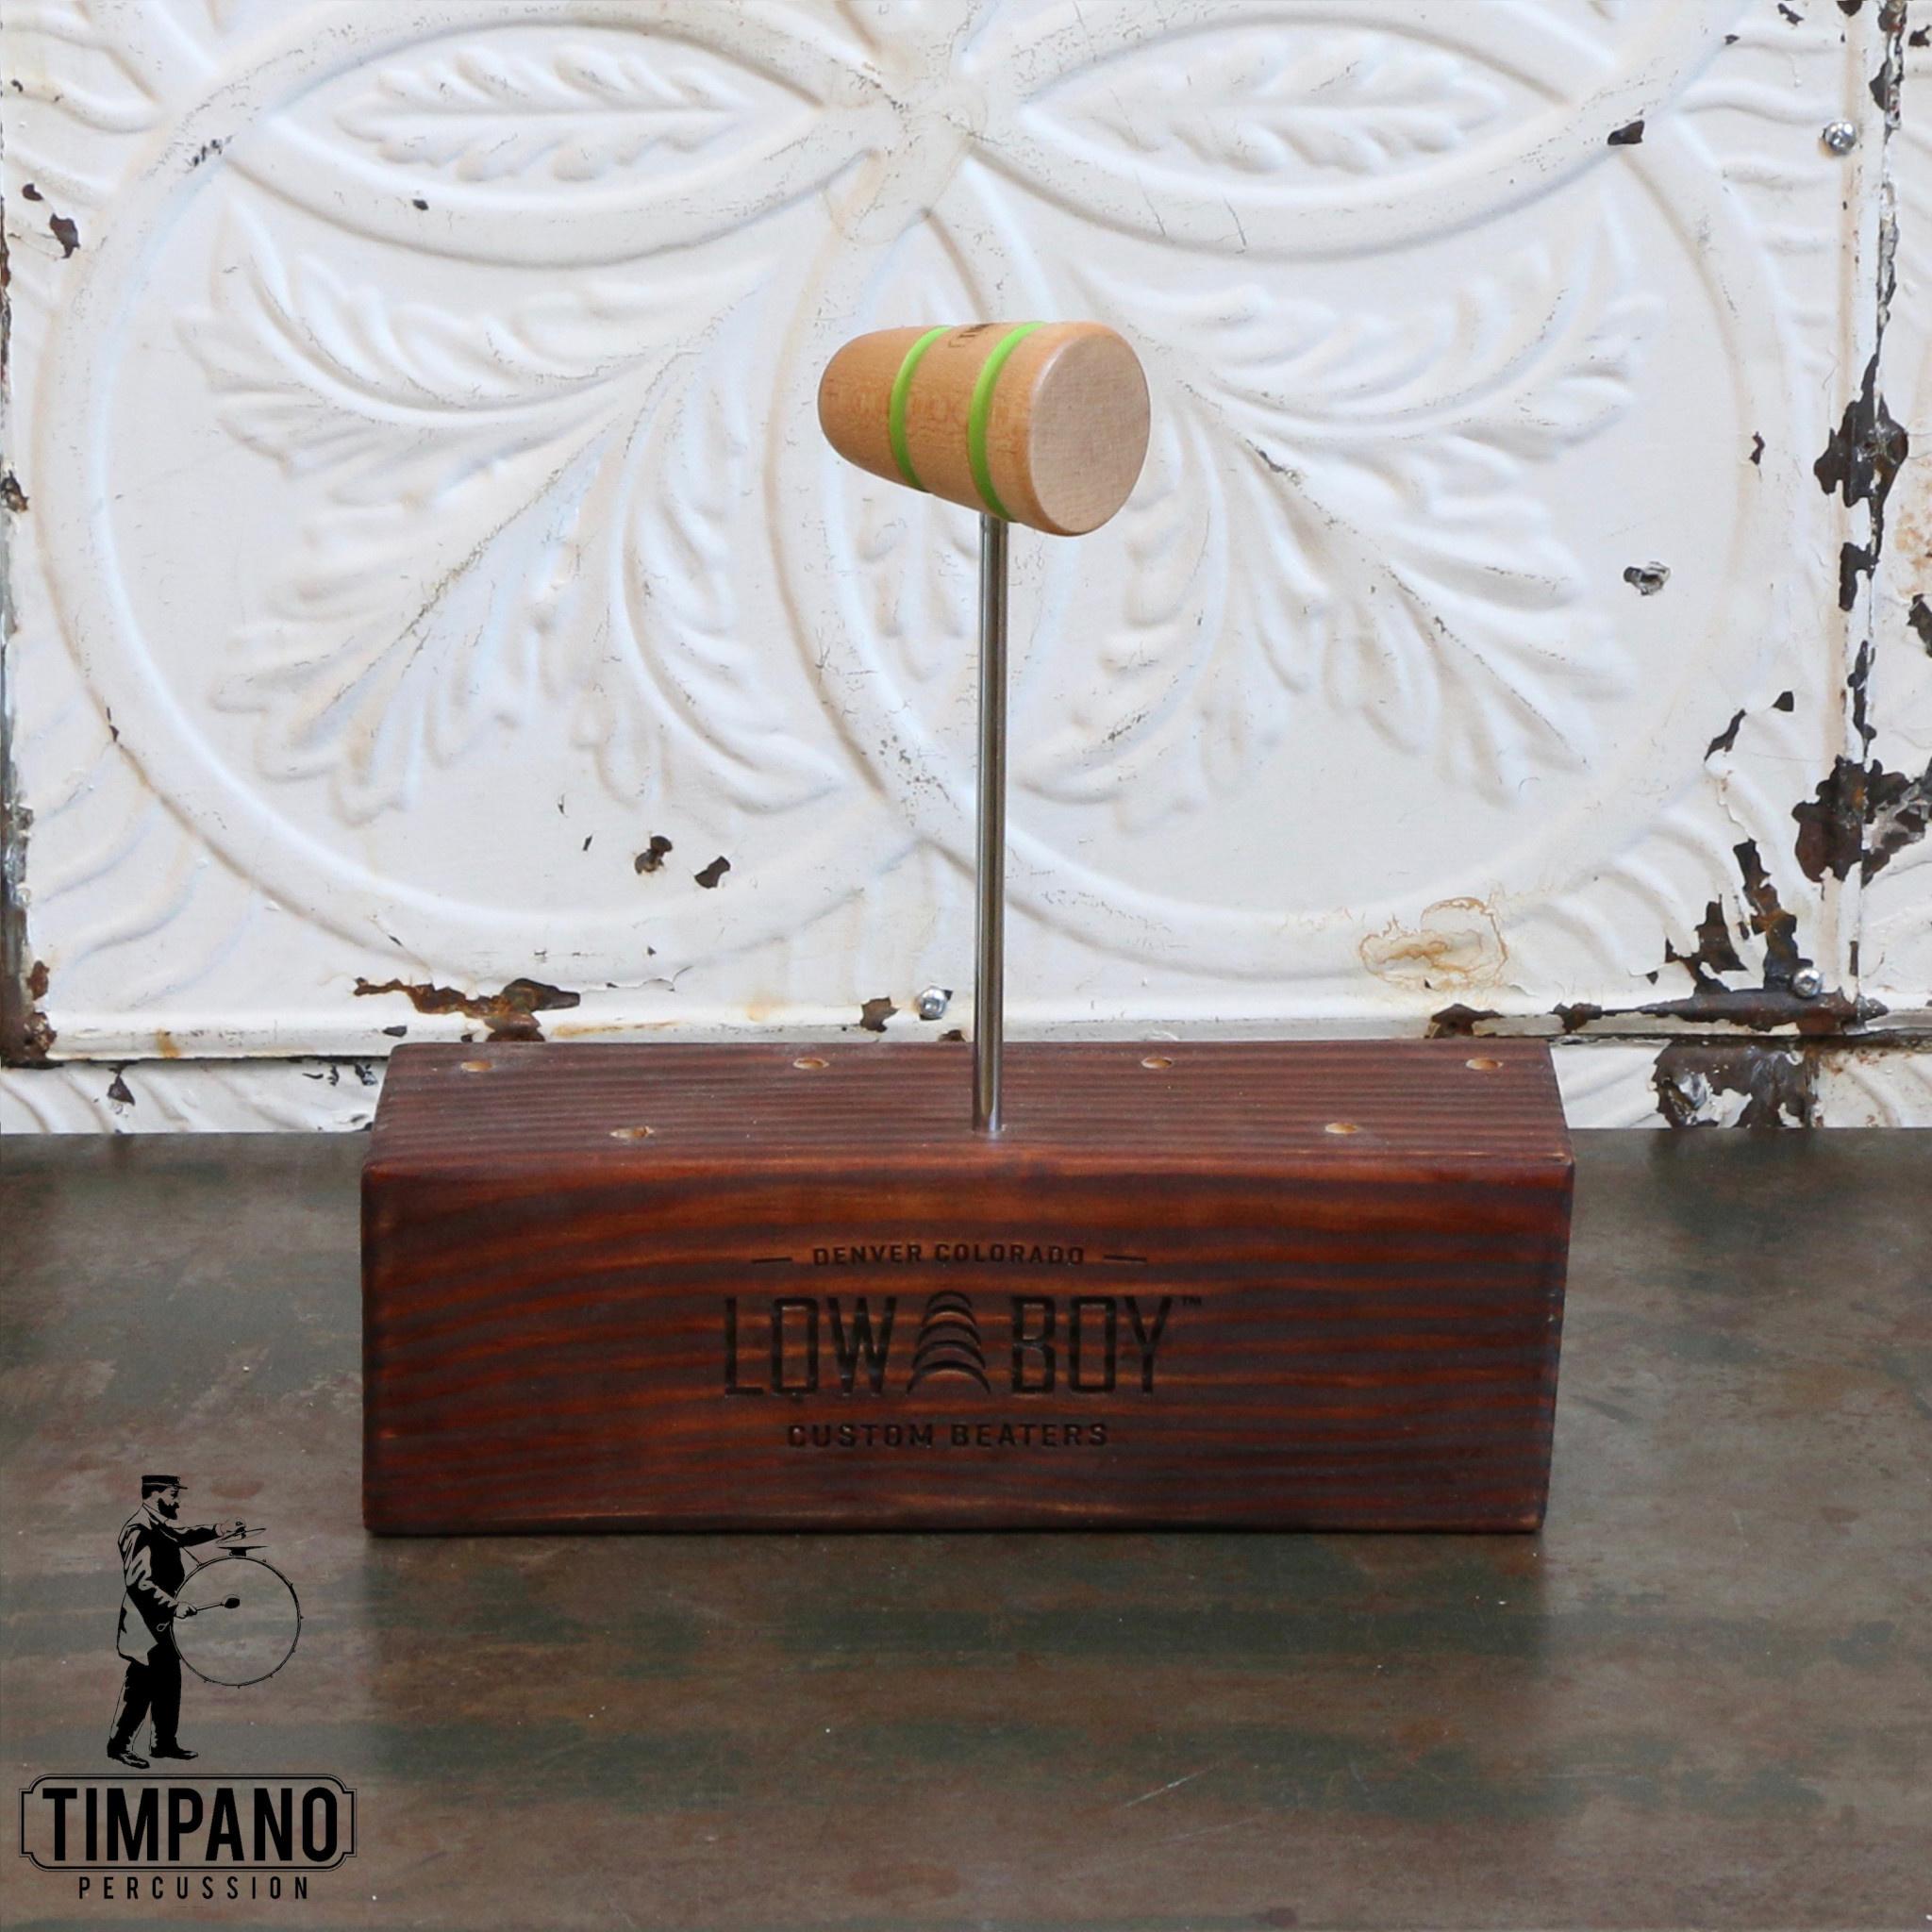 Low Boy Low Boy Standard Timpano Bass Drum Beater (natural, green line)